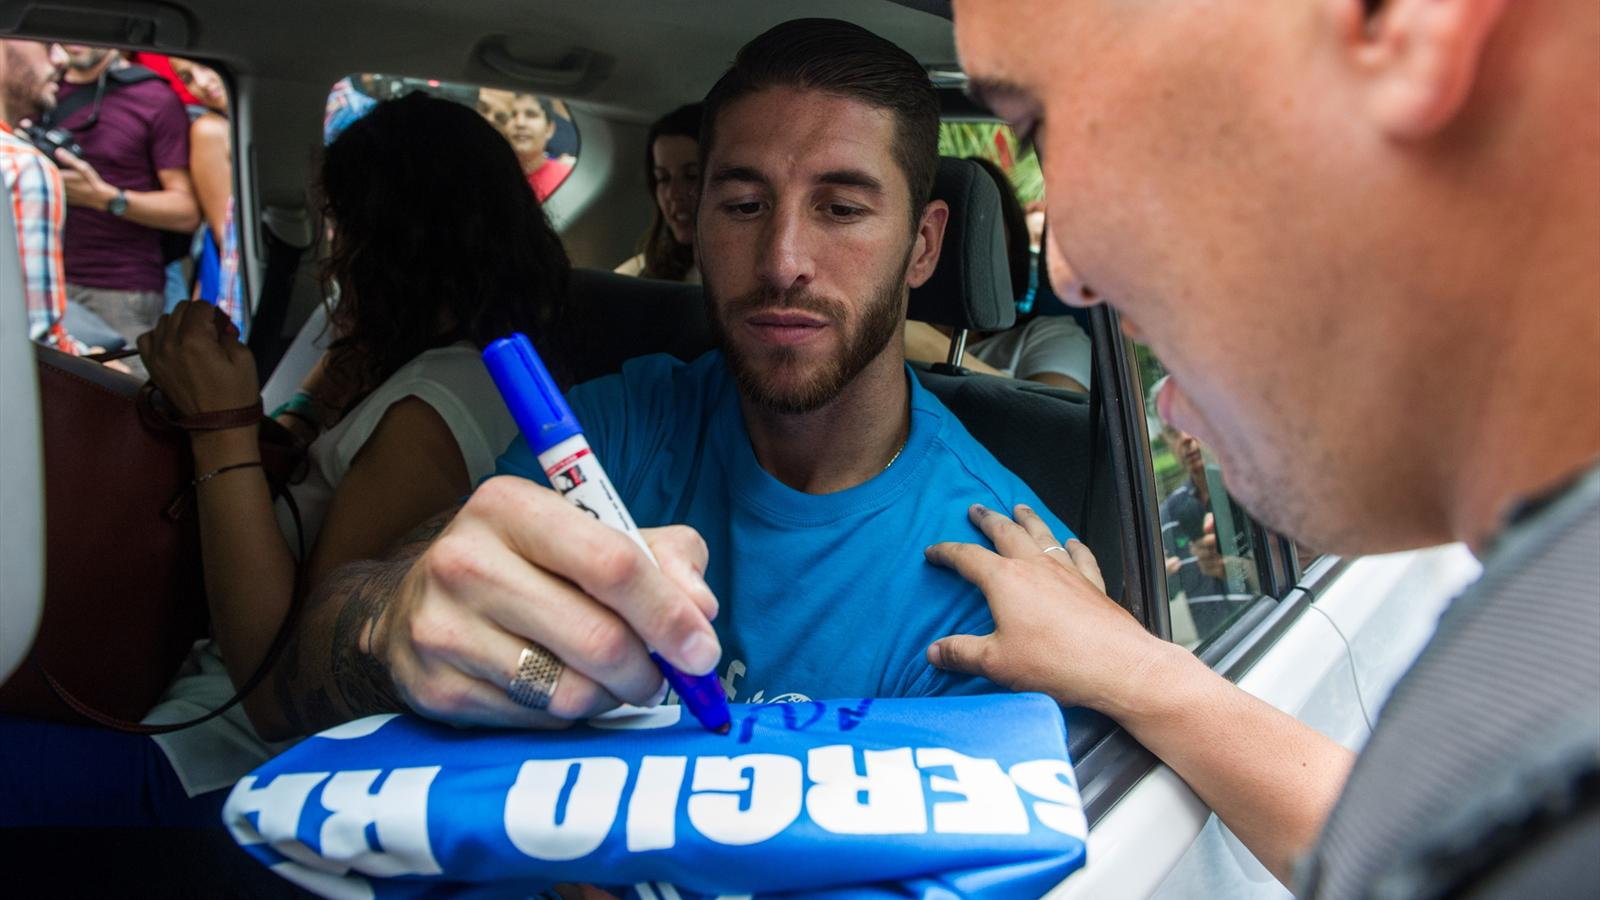 Spanish Real Madrid football team player Sergio Ramos autographs a jersey in Havana, on June 16, 2015